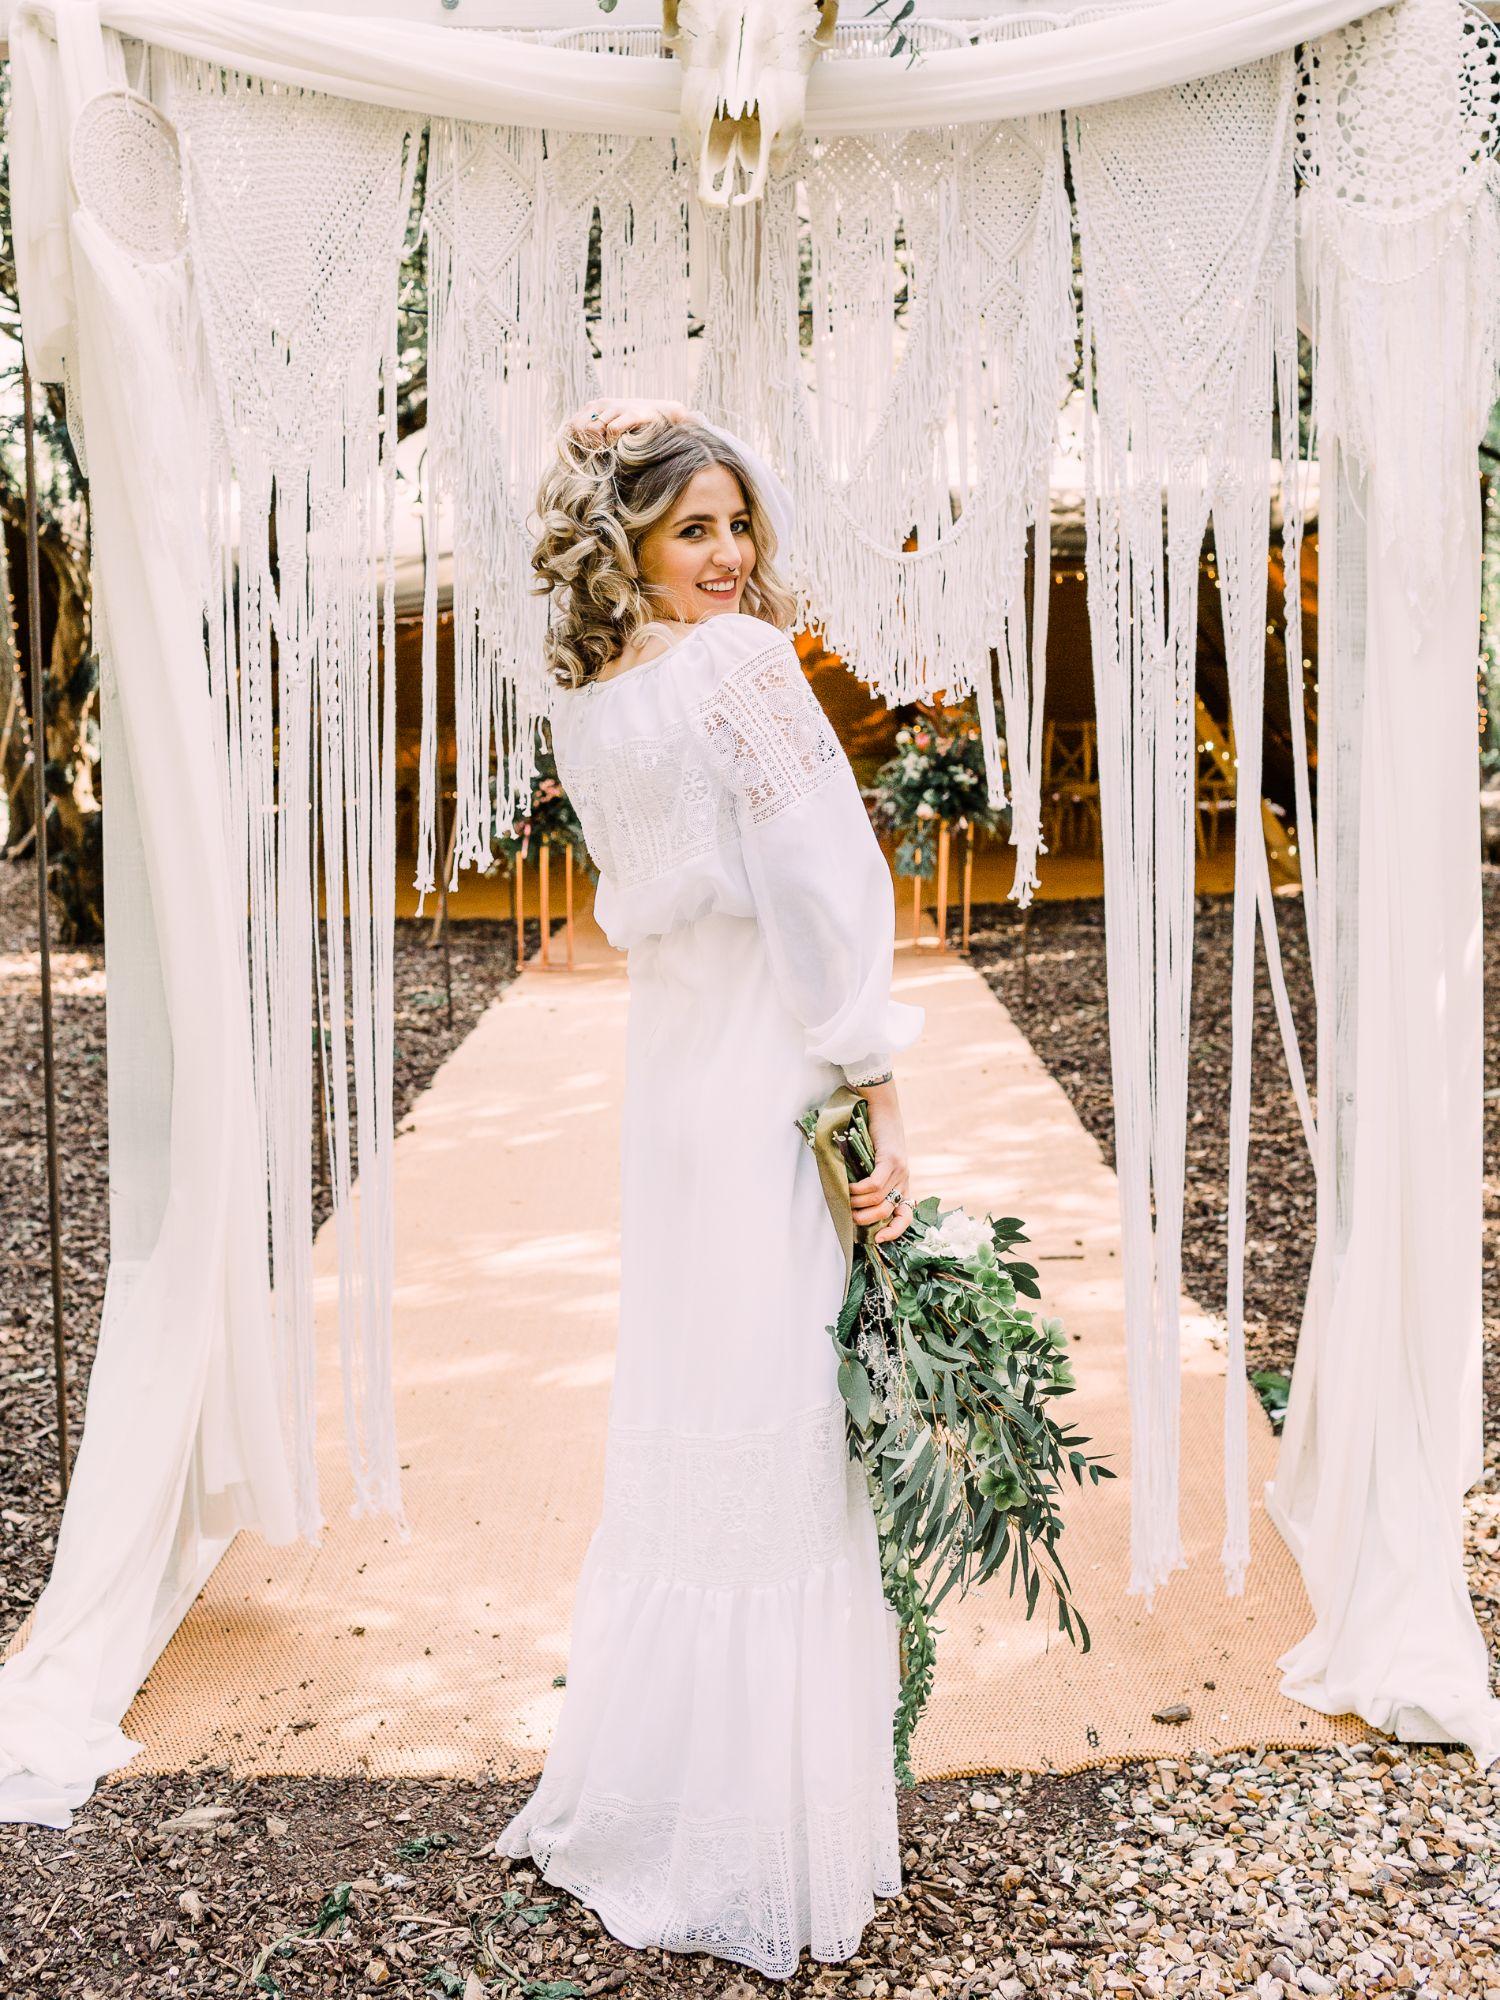 Lichfield boho weddings